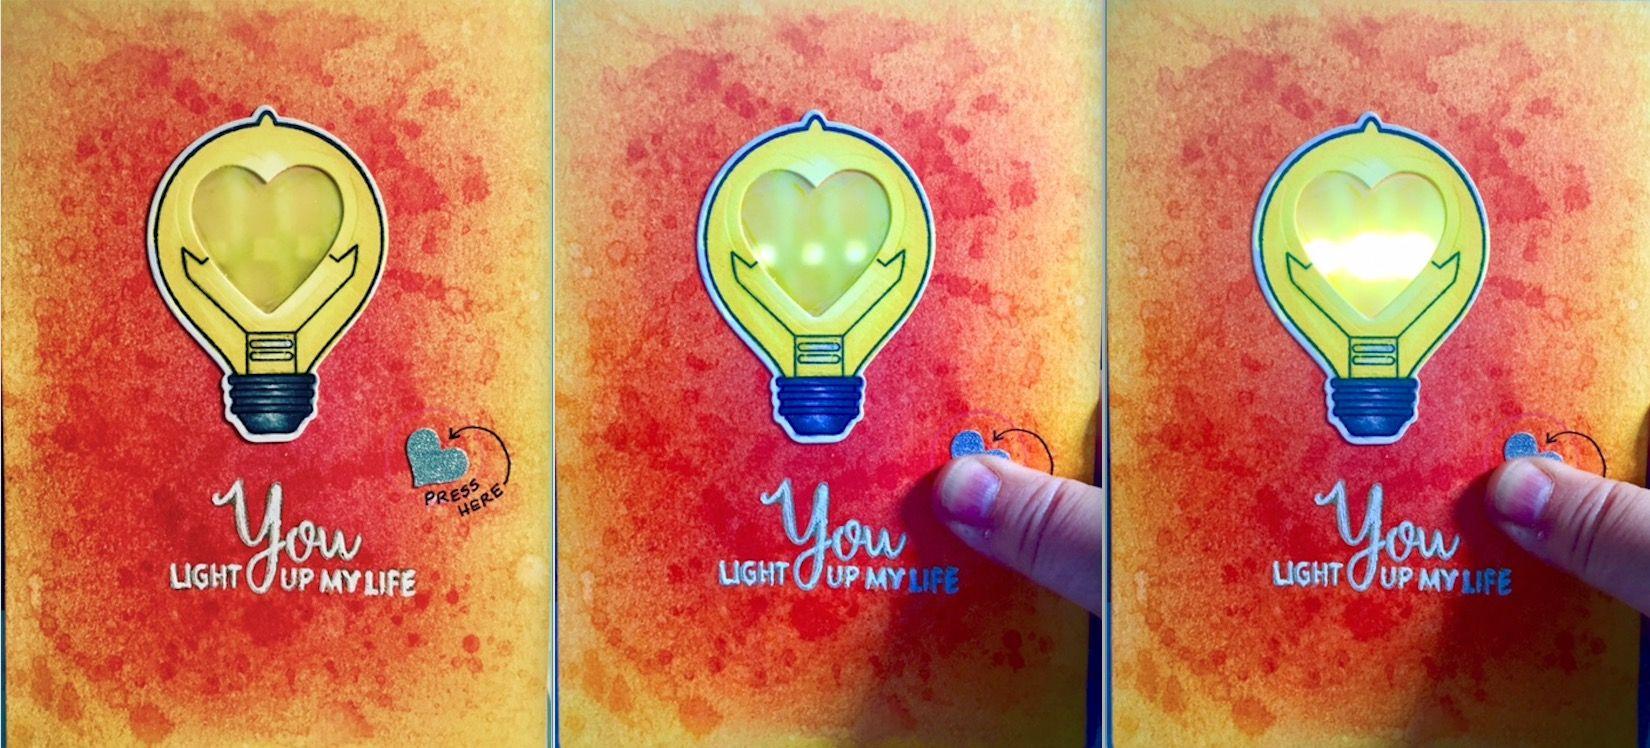 Technique Tuesday Light Bulb Moment에 대한 이미지 검색결과